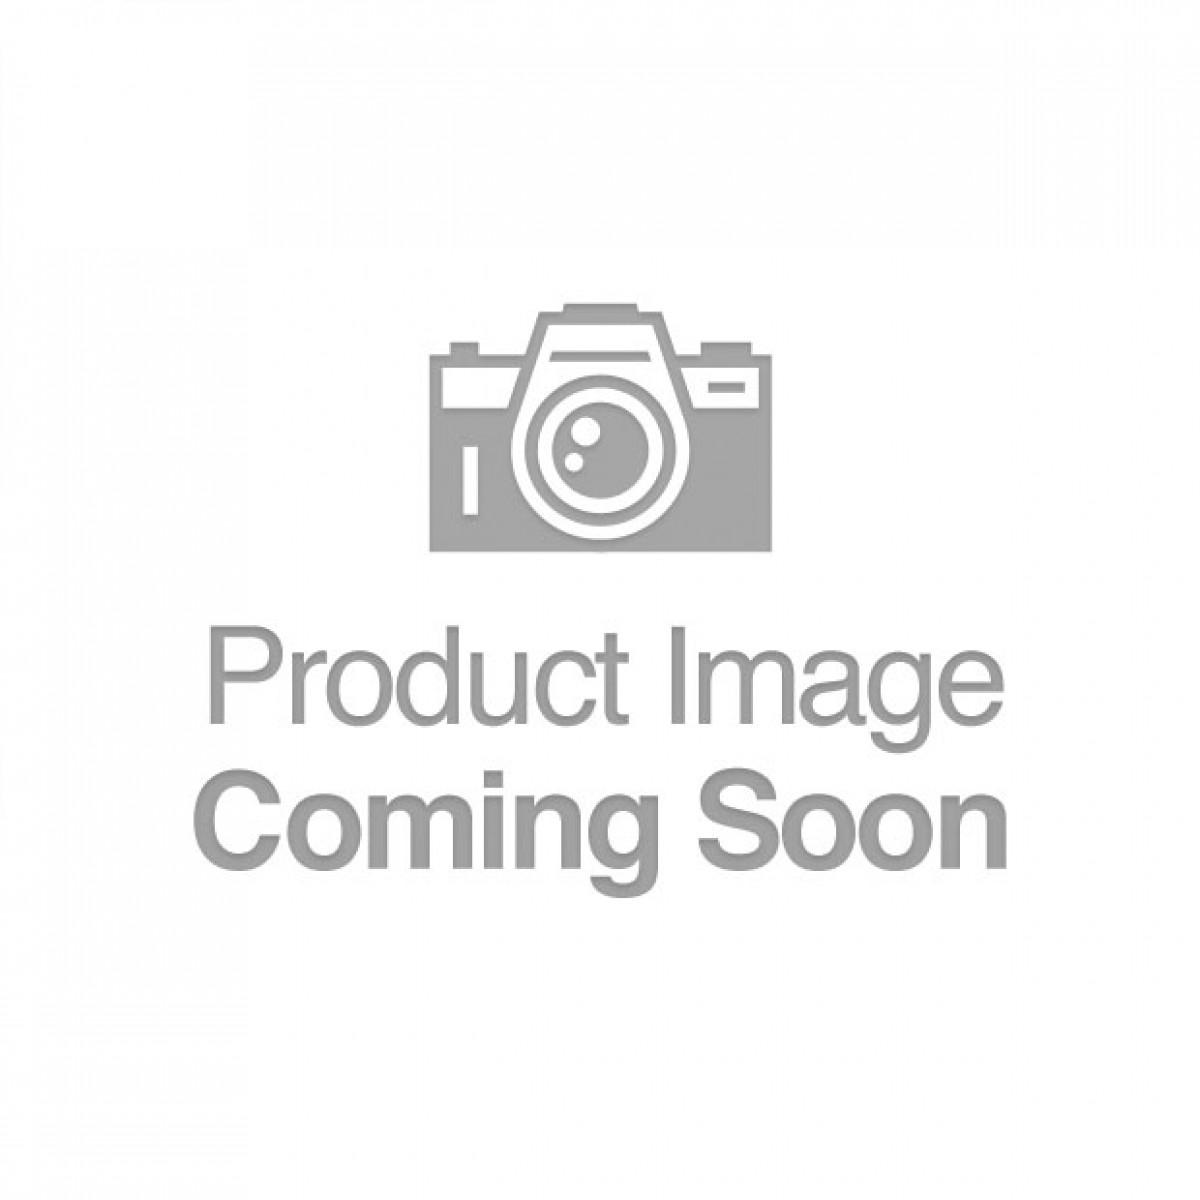 Strap U 10x Swirl Ergo-Fit Inflatable & Vibrating Strapless Strap On - Black